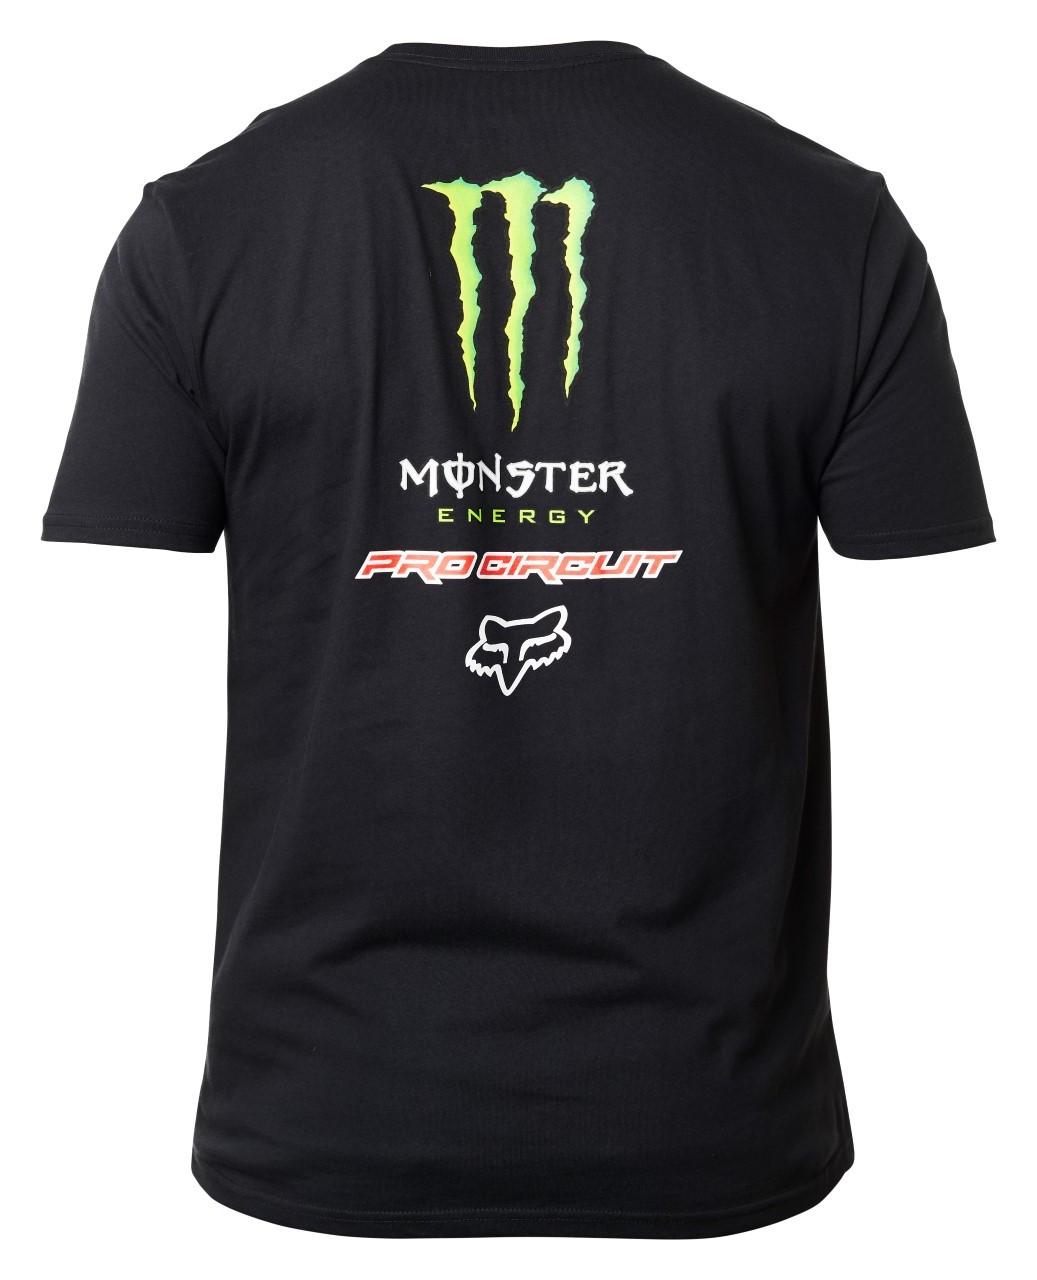 09b6fac44 Fox Racing Monster Energy Pro Circuit T-Shirt - Cycle Gear